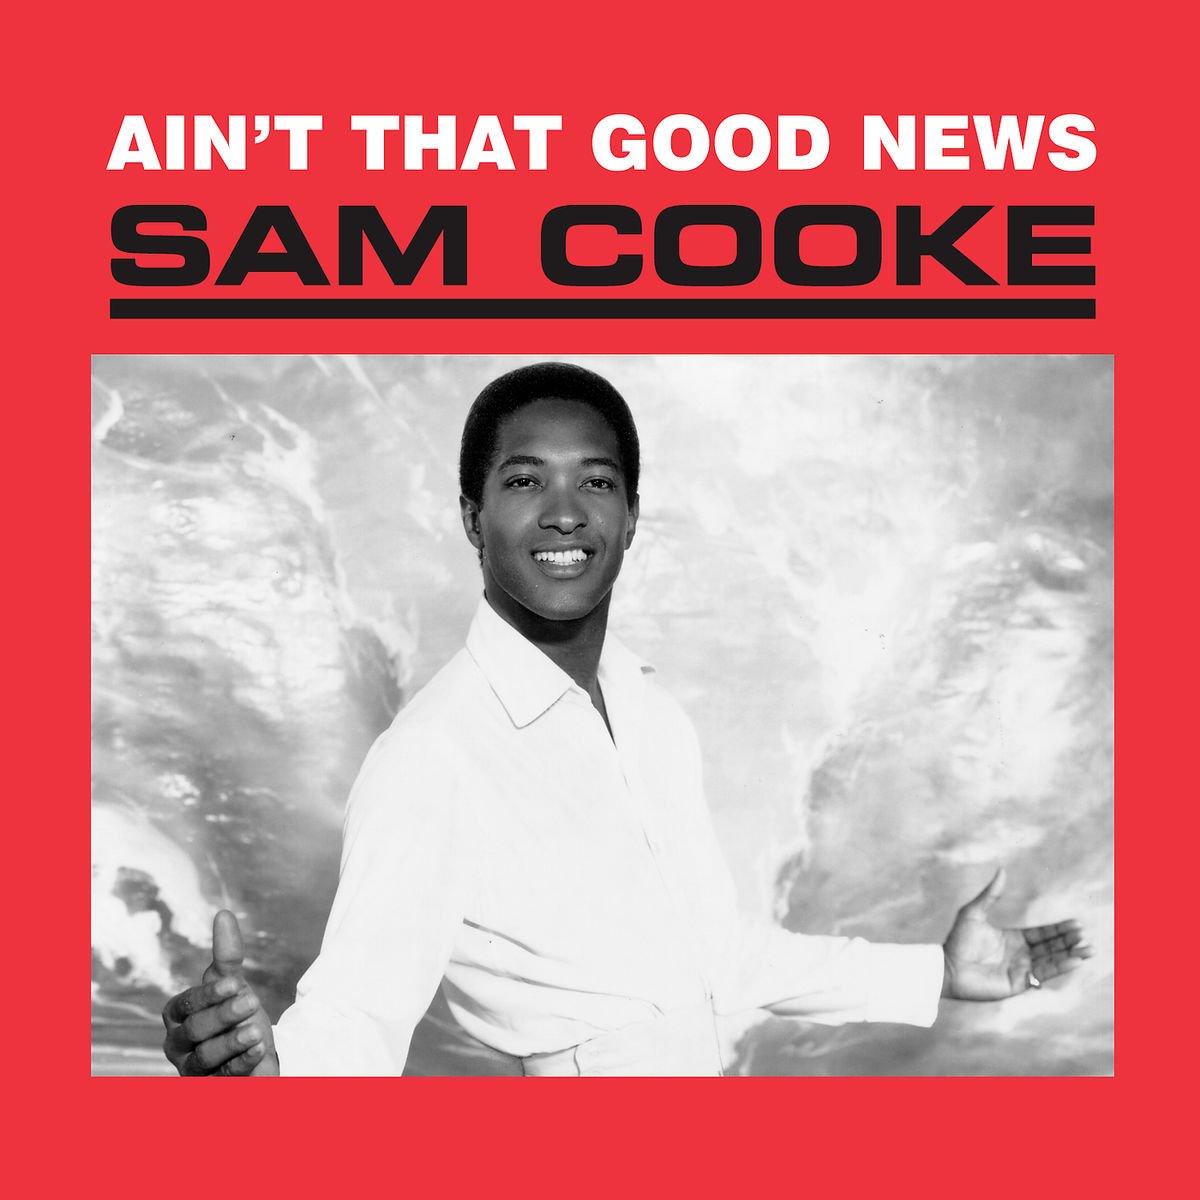 CD : Sam Cooke - Ain't That Good News (CD)